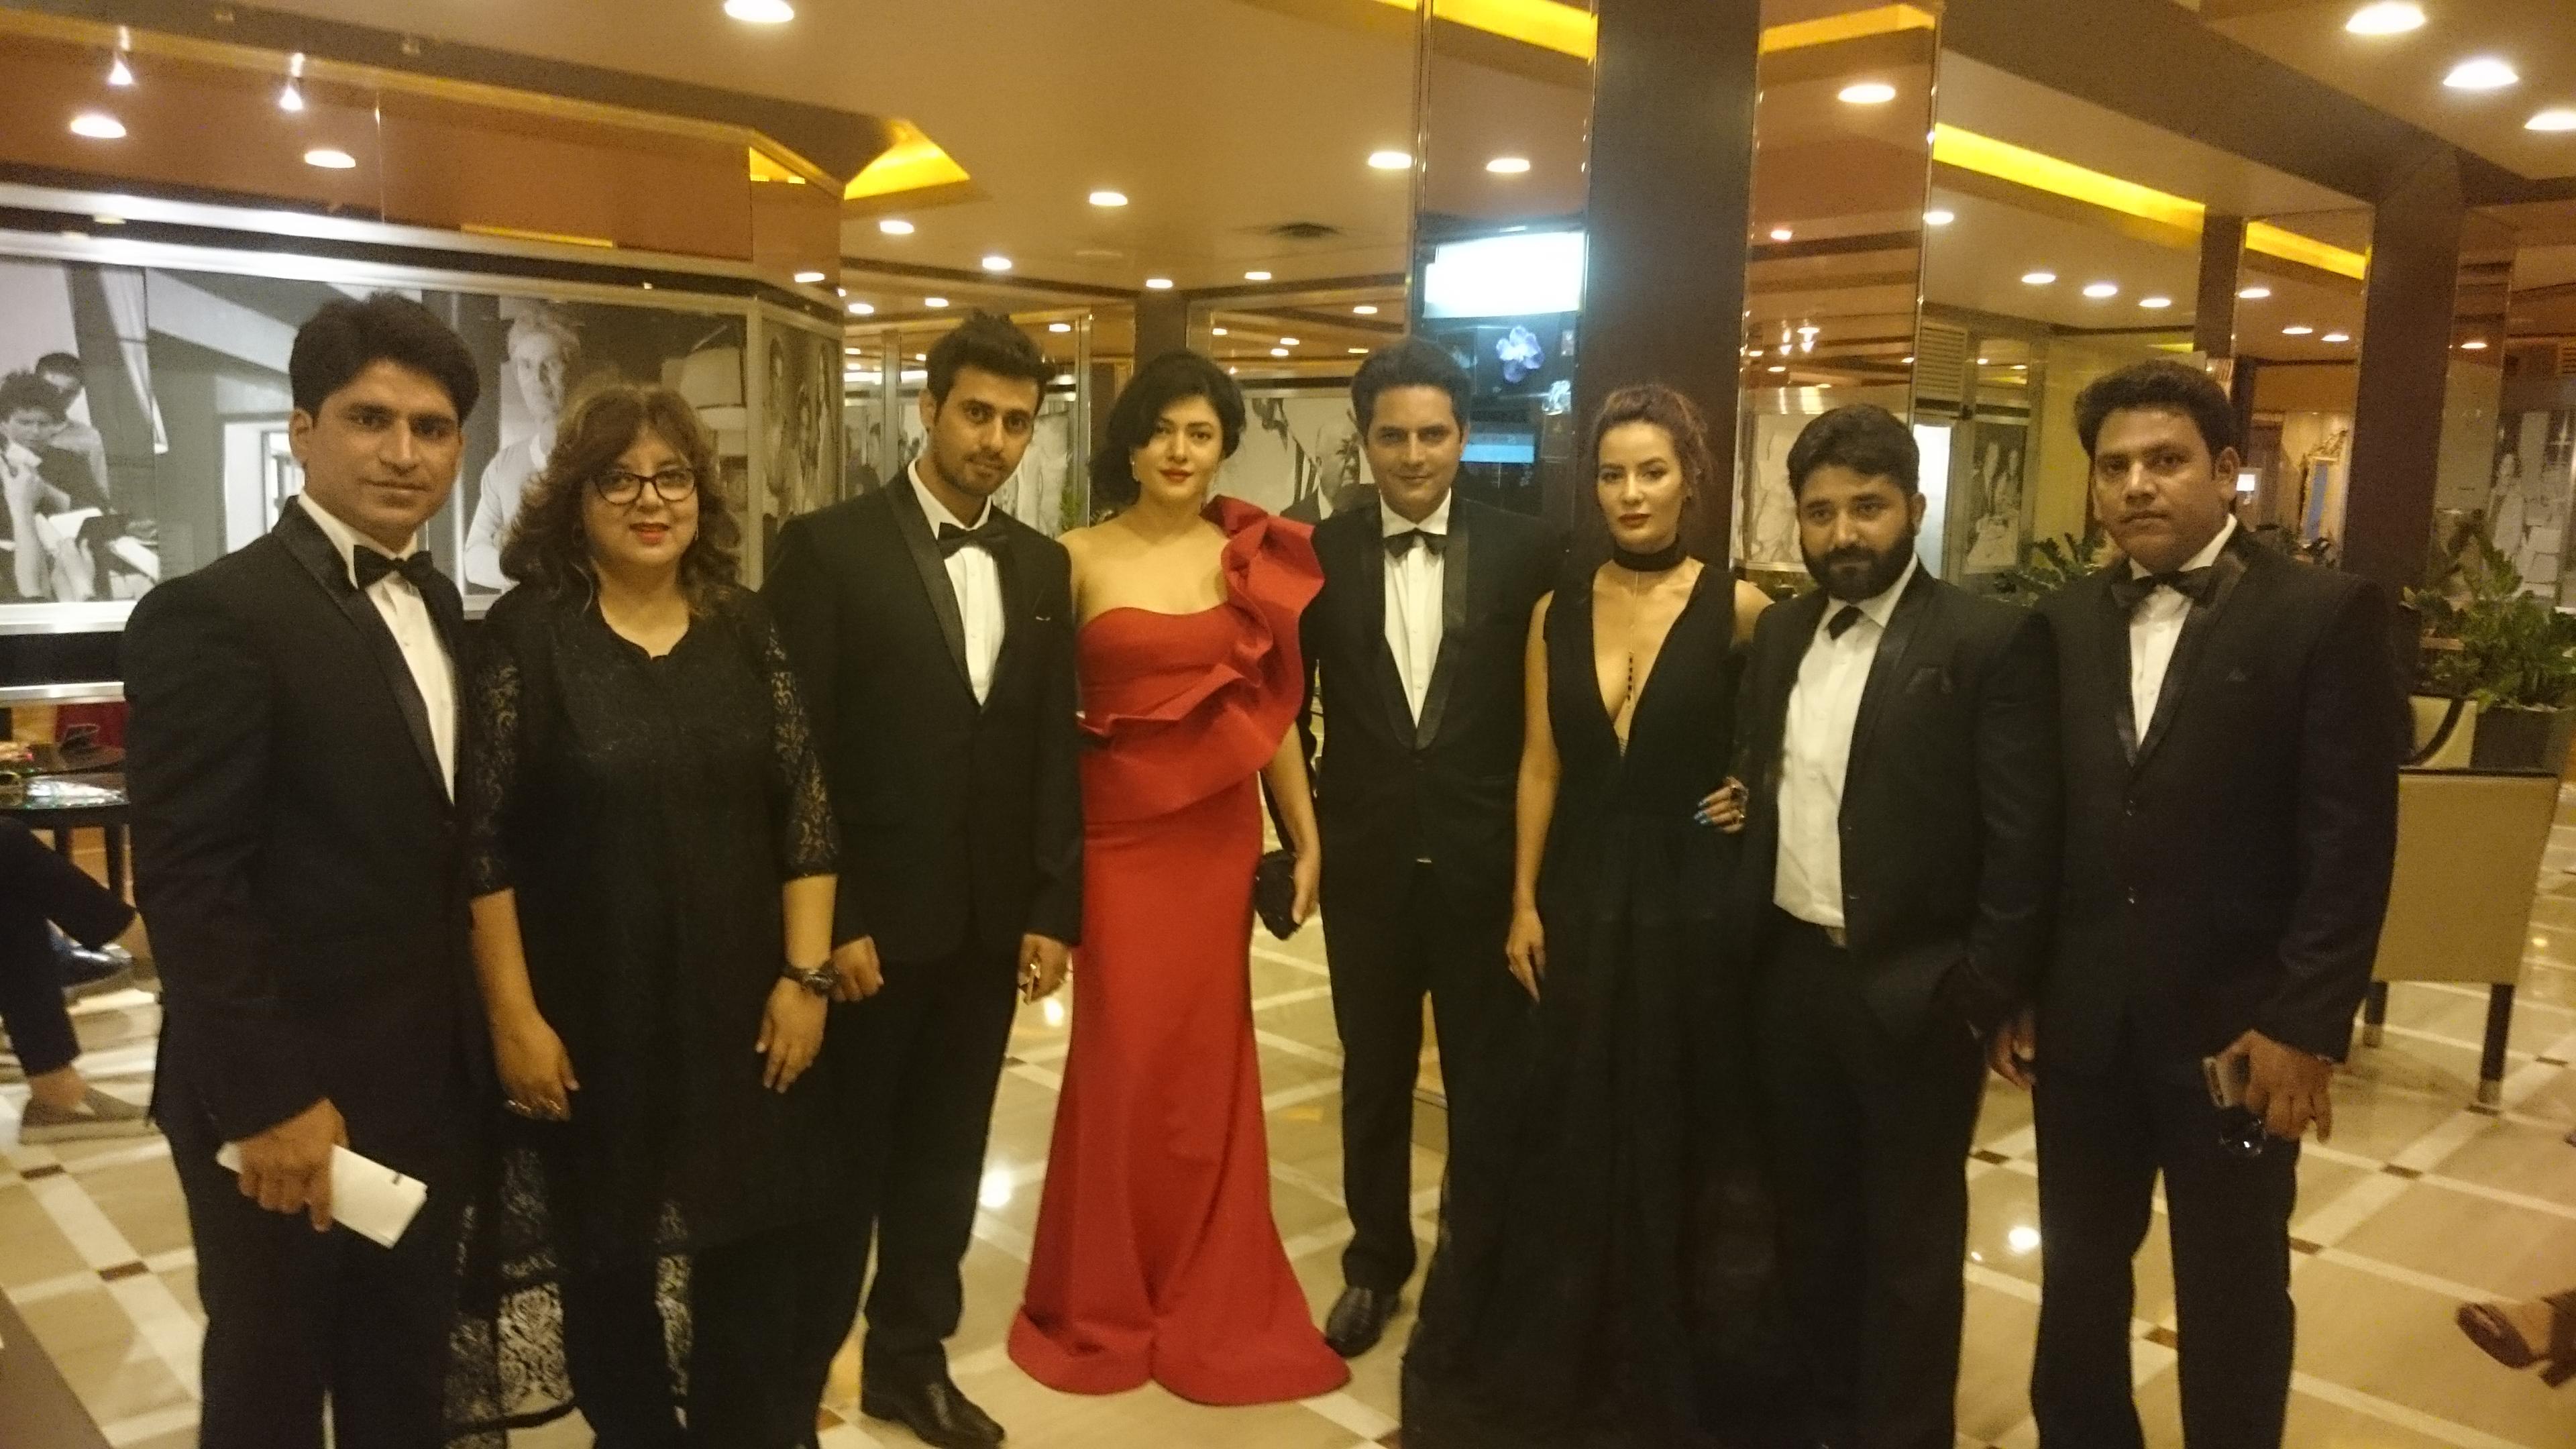 Mujeeb Ul Hassan, Co-Producer Zeba Sajid, Shoib Nikash Shah, Sonal Sehgal, Director Rahat Kazmi, Raina Bassnet, Producer Tariq Khan & Jitesh Kumar At Premiere of Mantostaan.